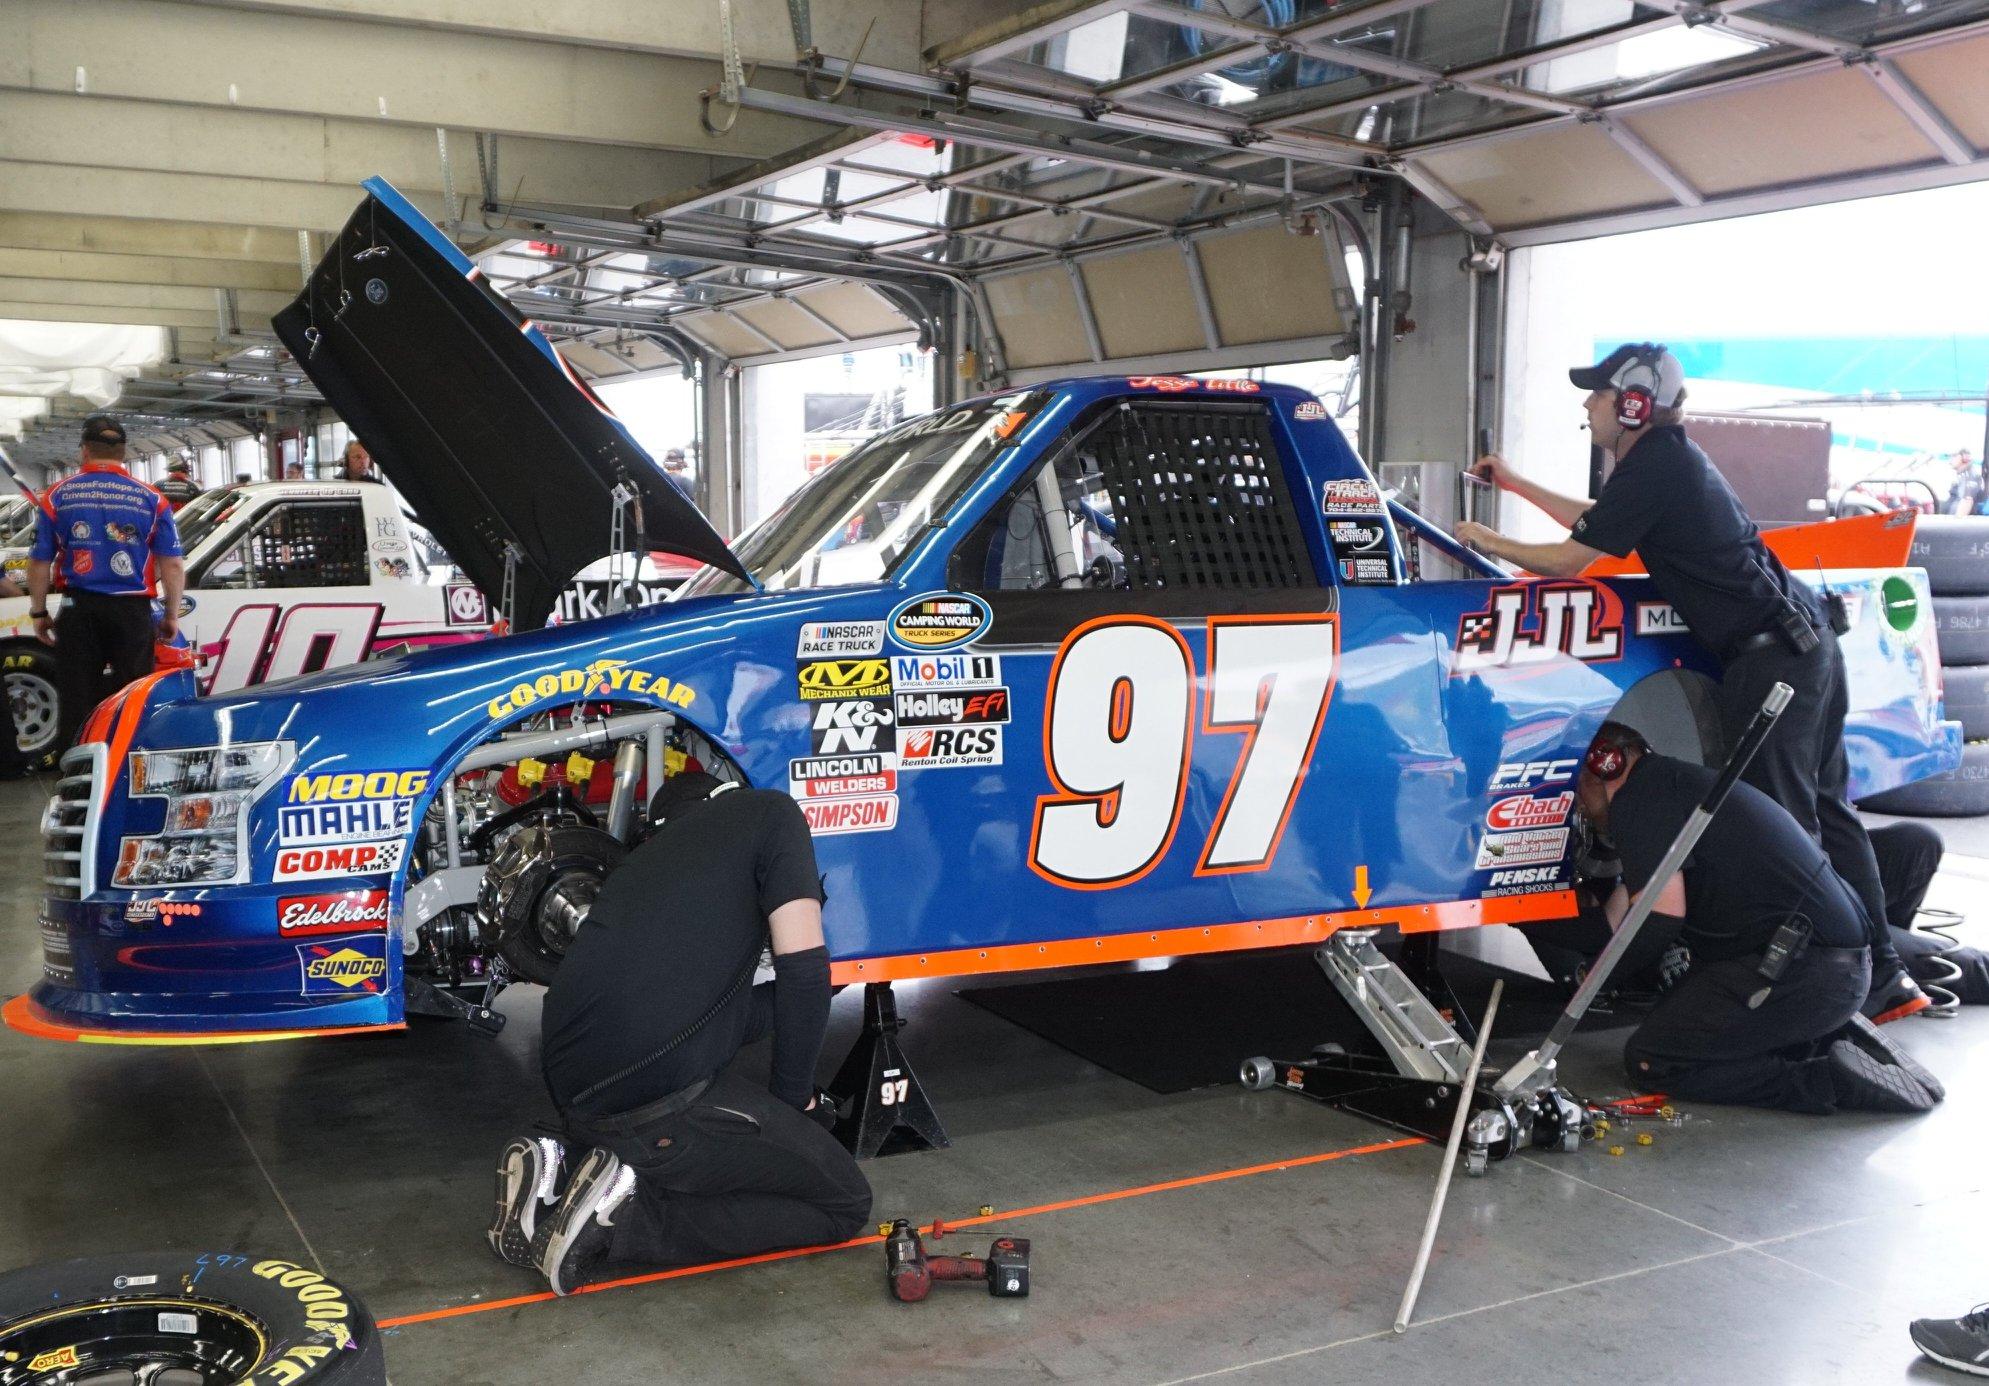 Jesse Little - Small NASCAR team